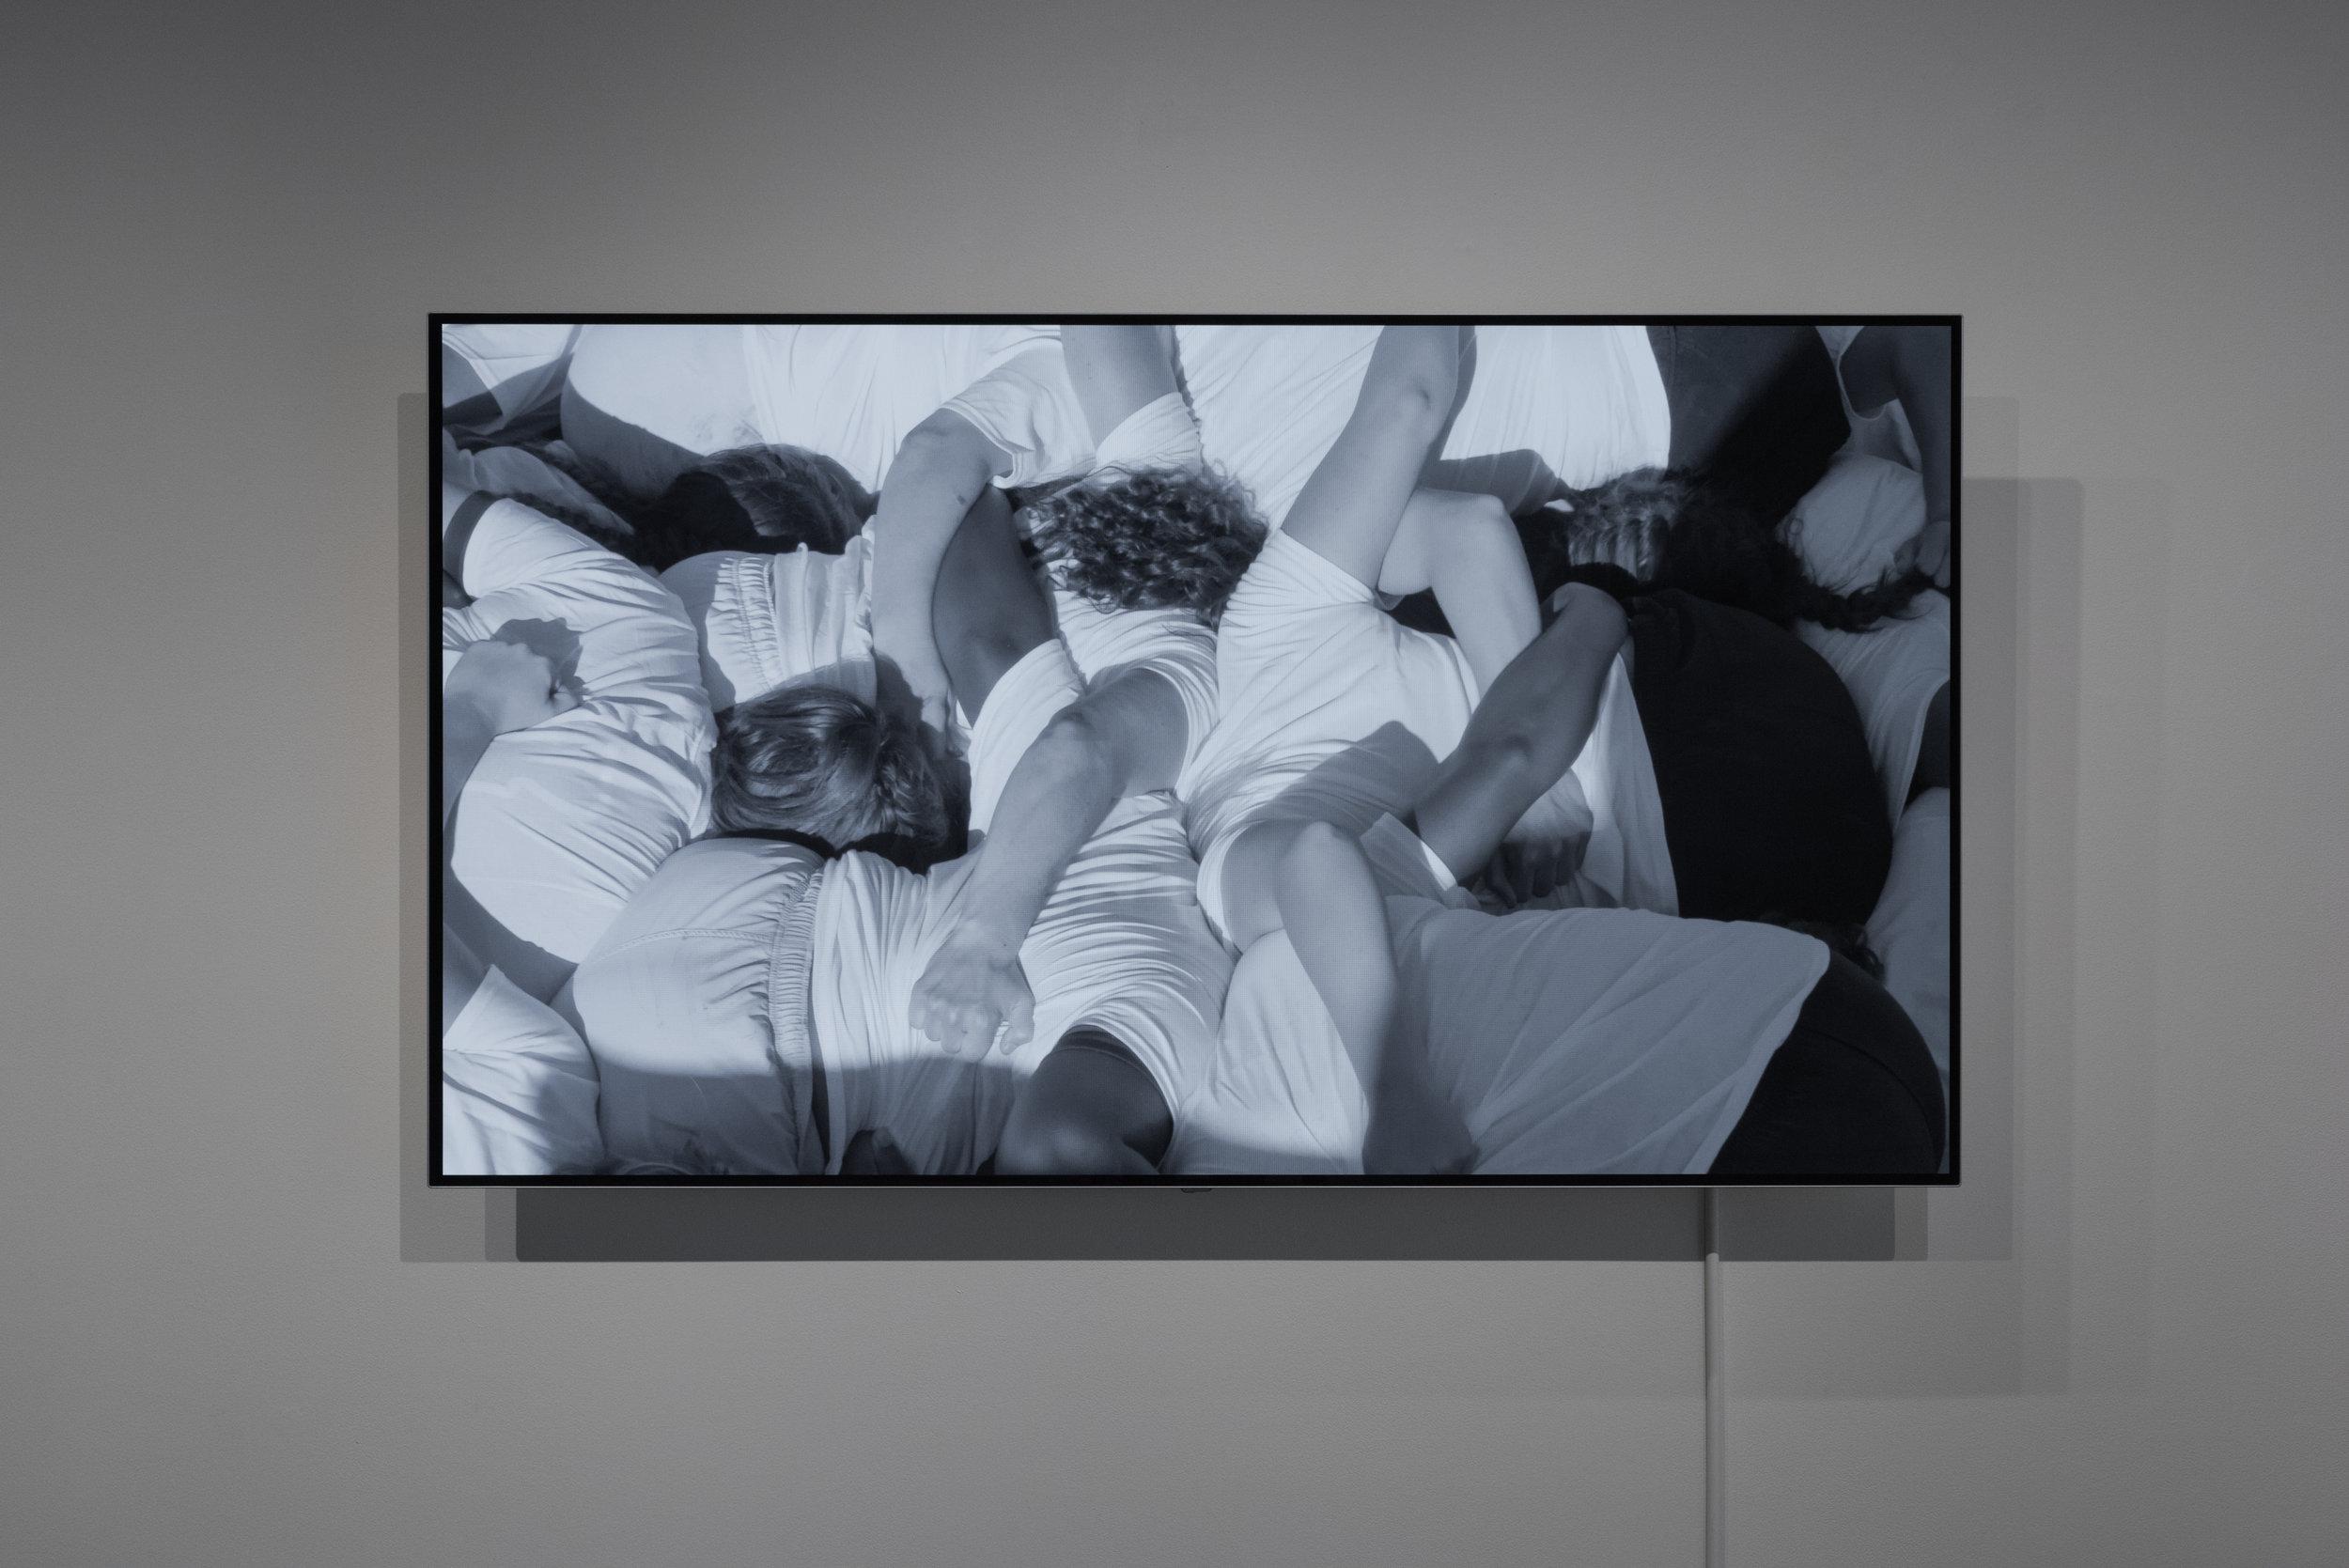 Scrum,  2017  video, 65 in. screen  edition 1/5, 2 APs